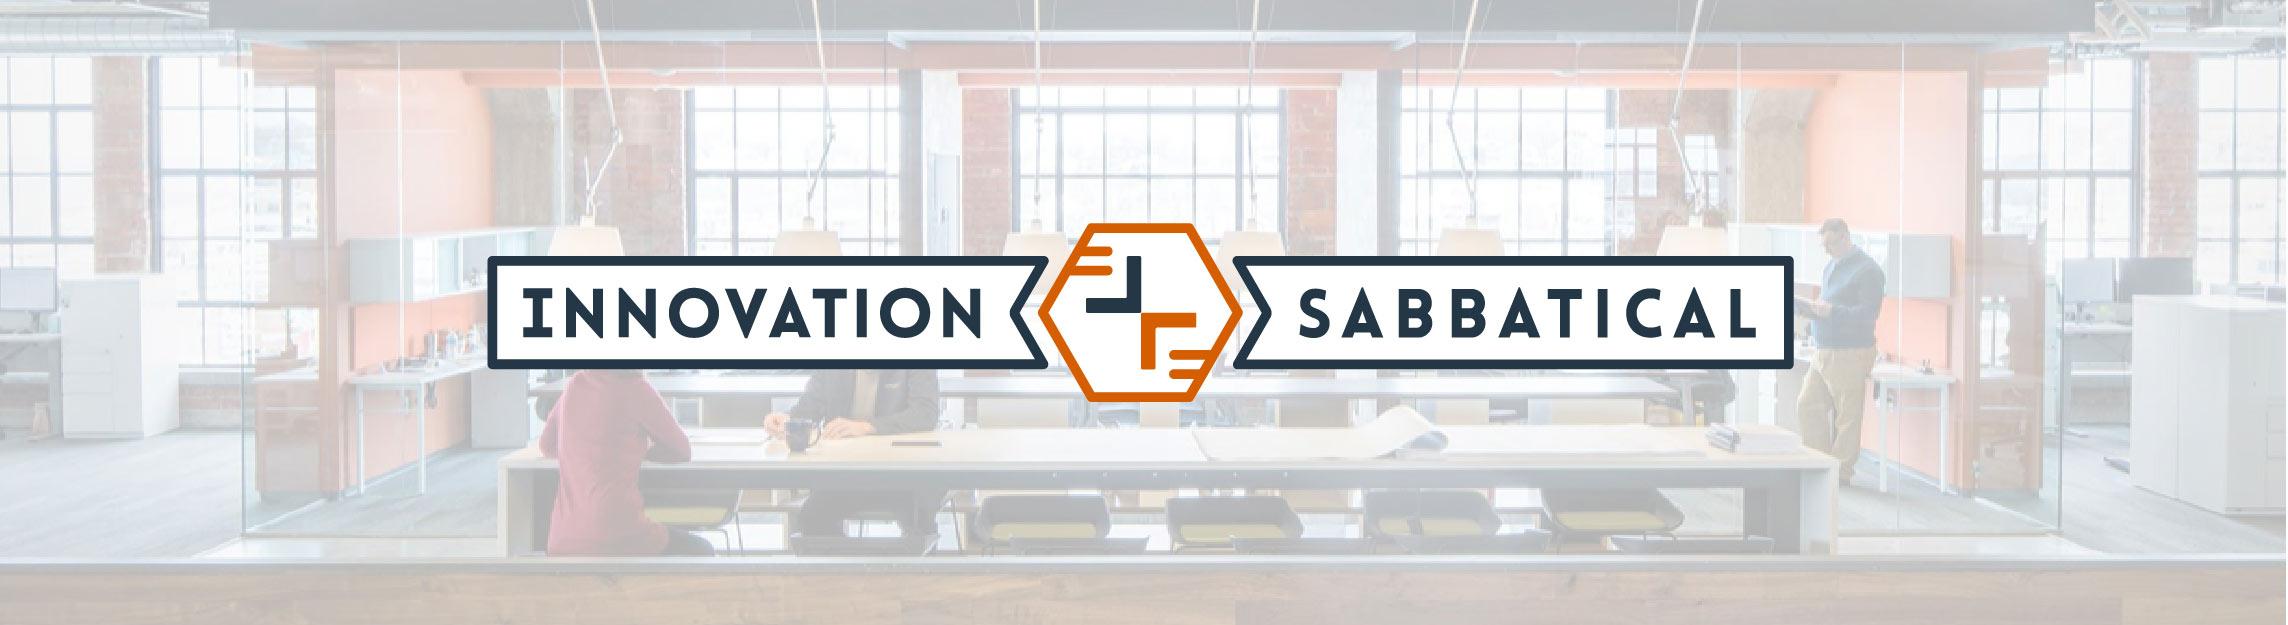 Innovation Sabbatical and Shared Language